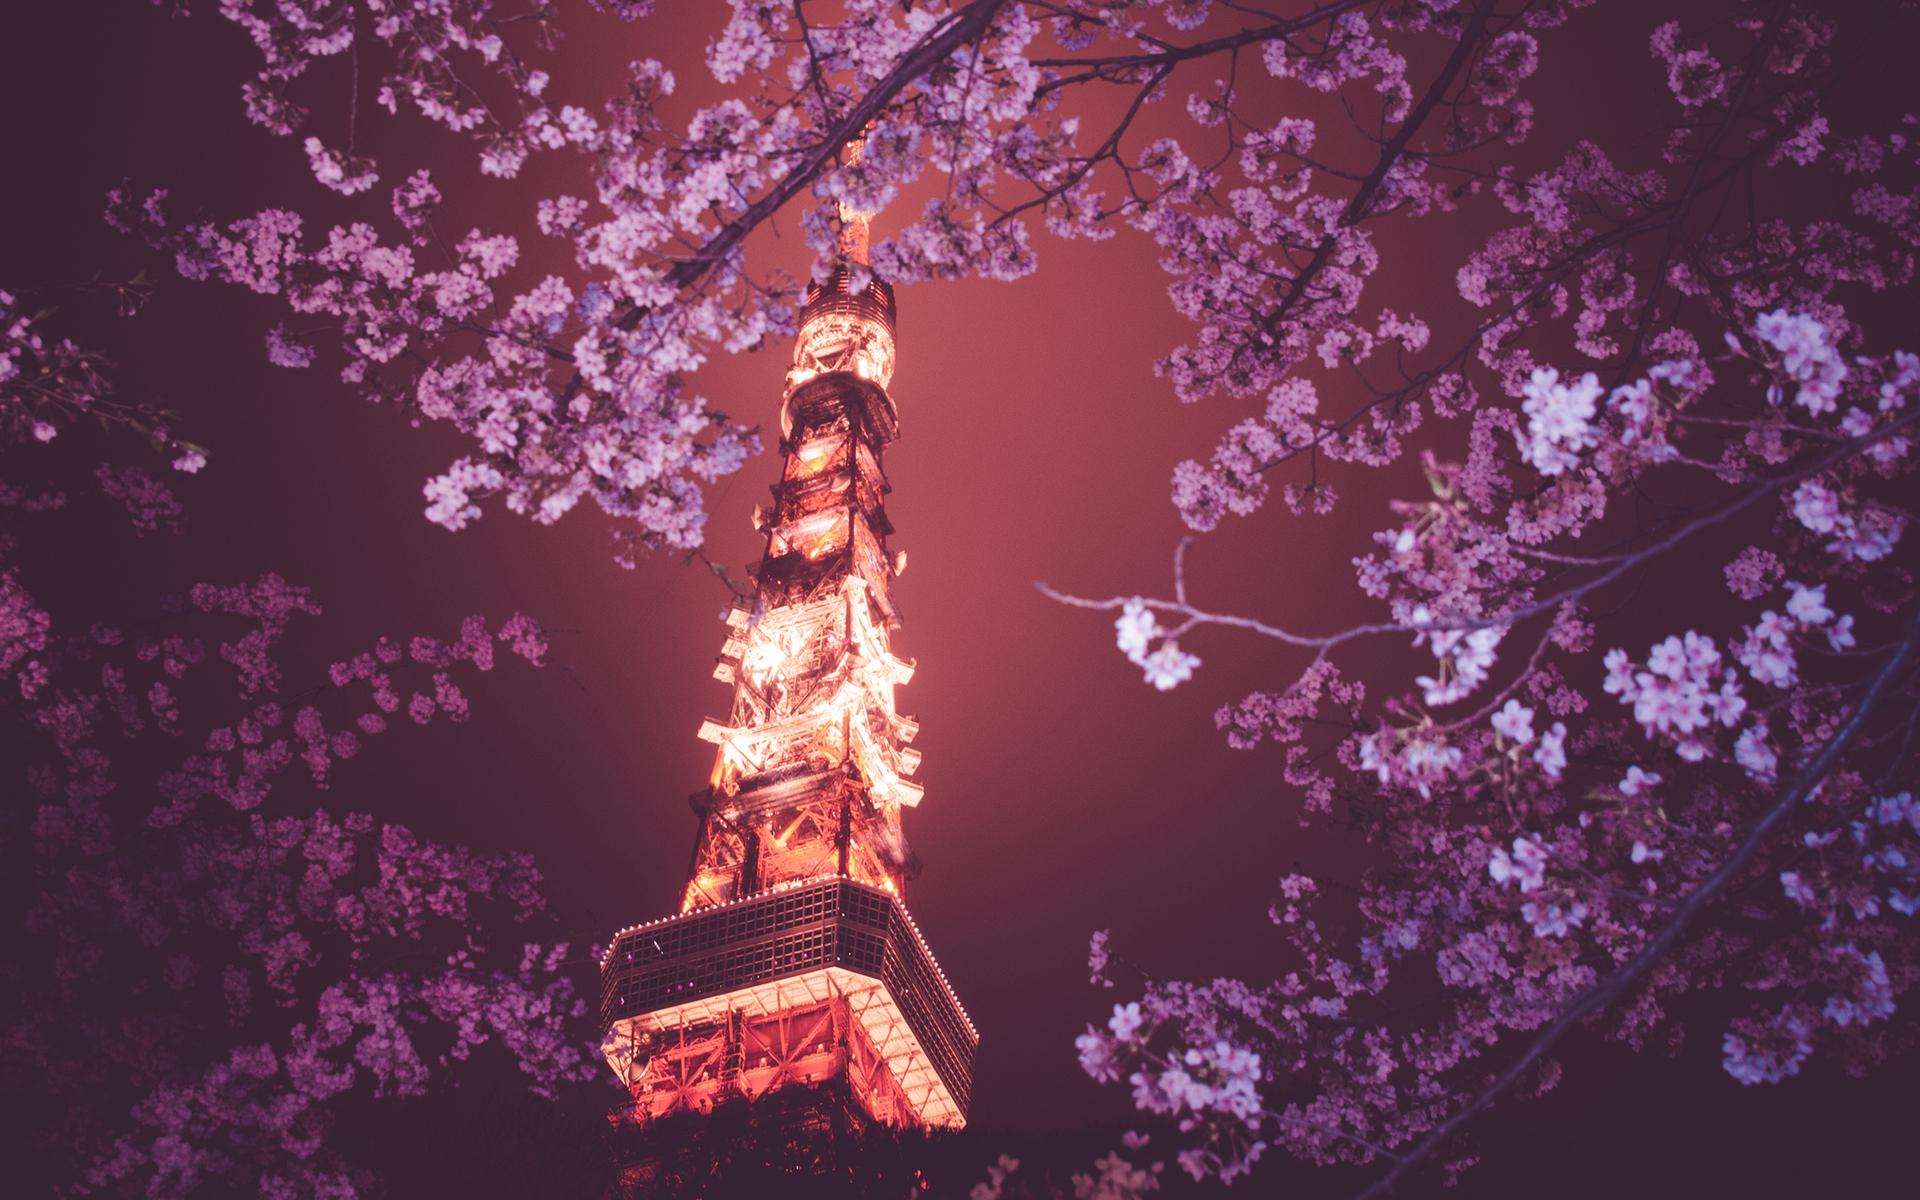 Cherry Blossom Tree at Night Tokyo Cherry Blossom Tree